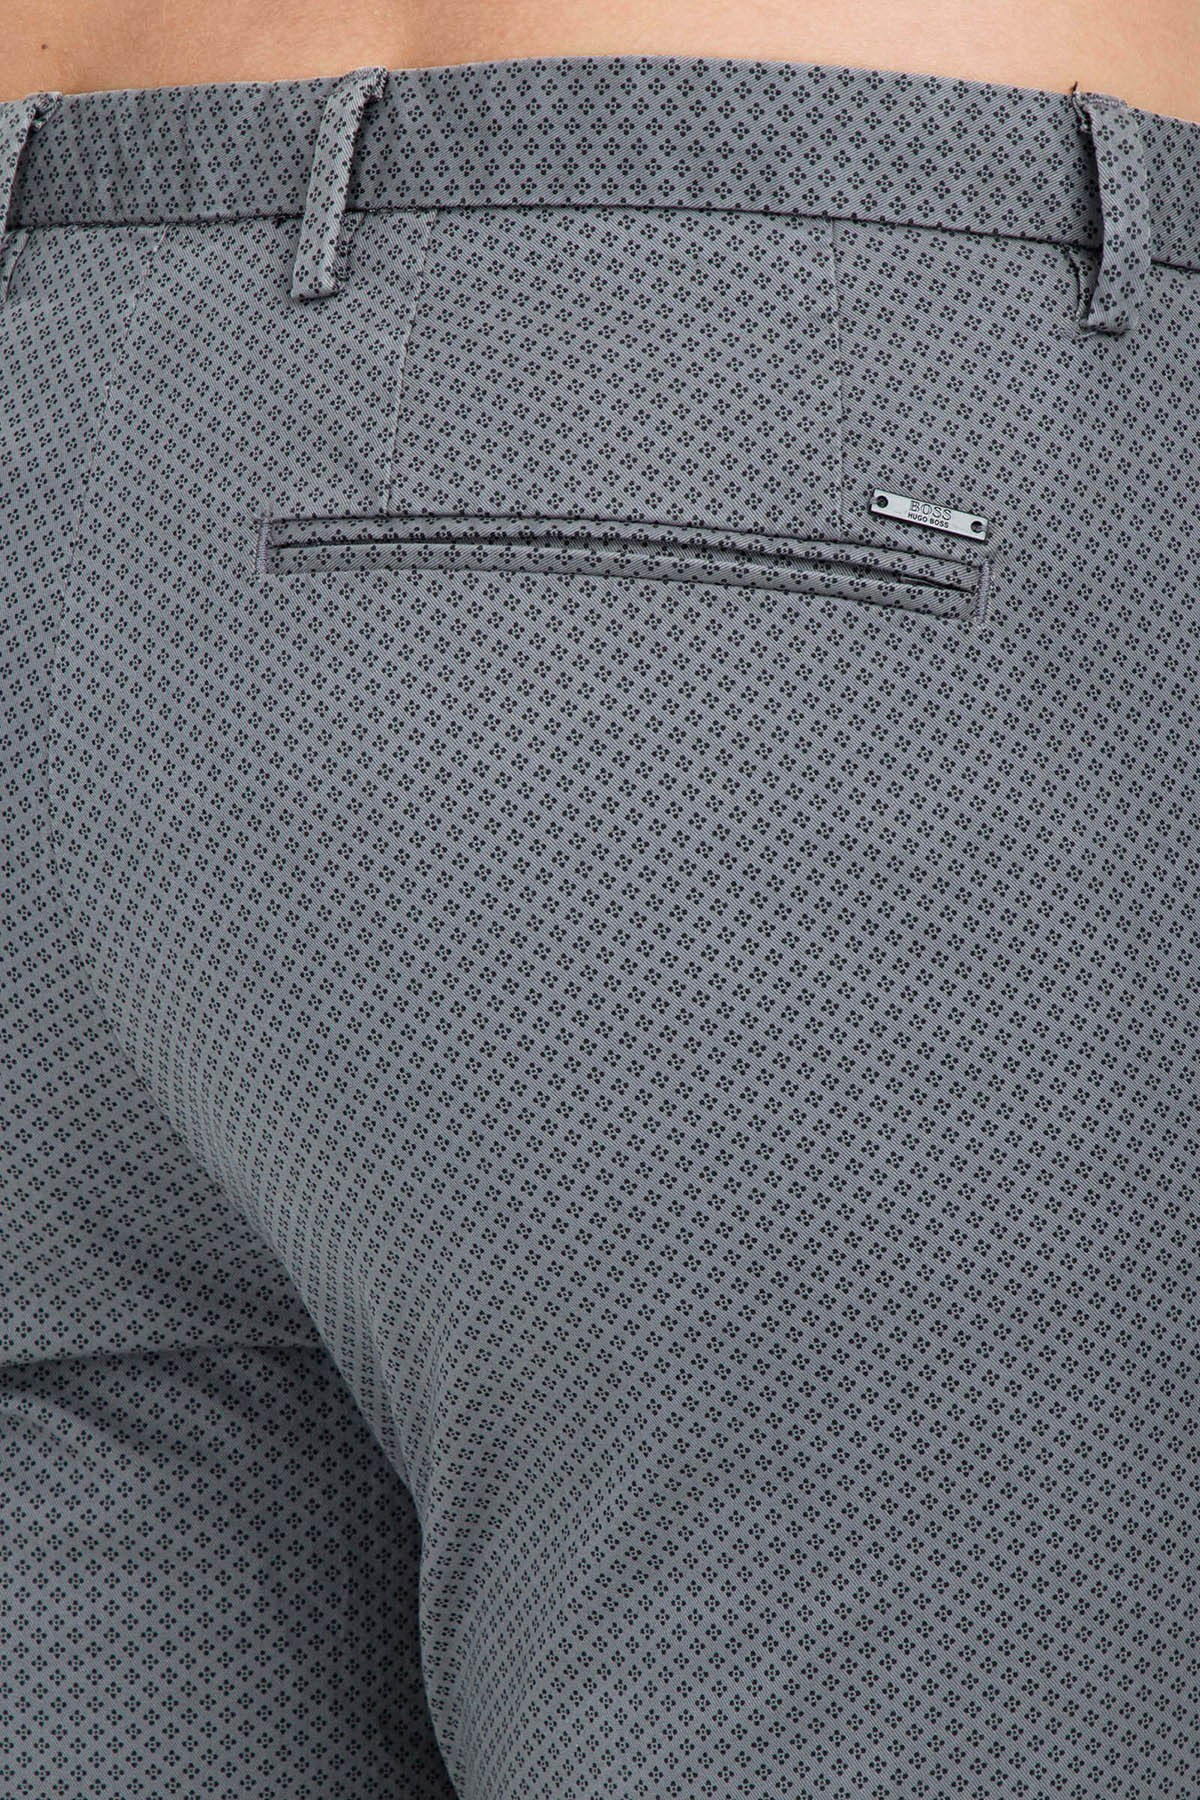 Hugo Boss Erkek Pantolon 50403785 030 GRİ